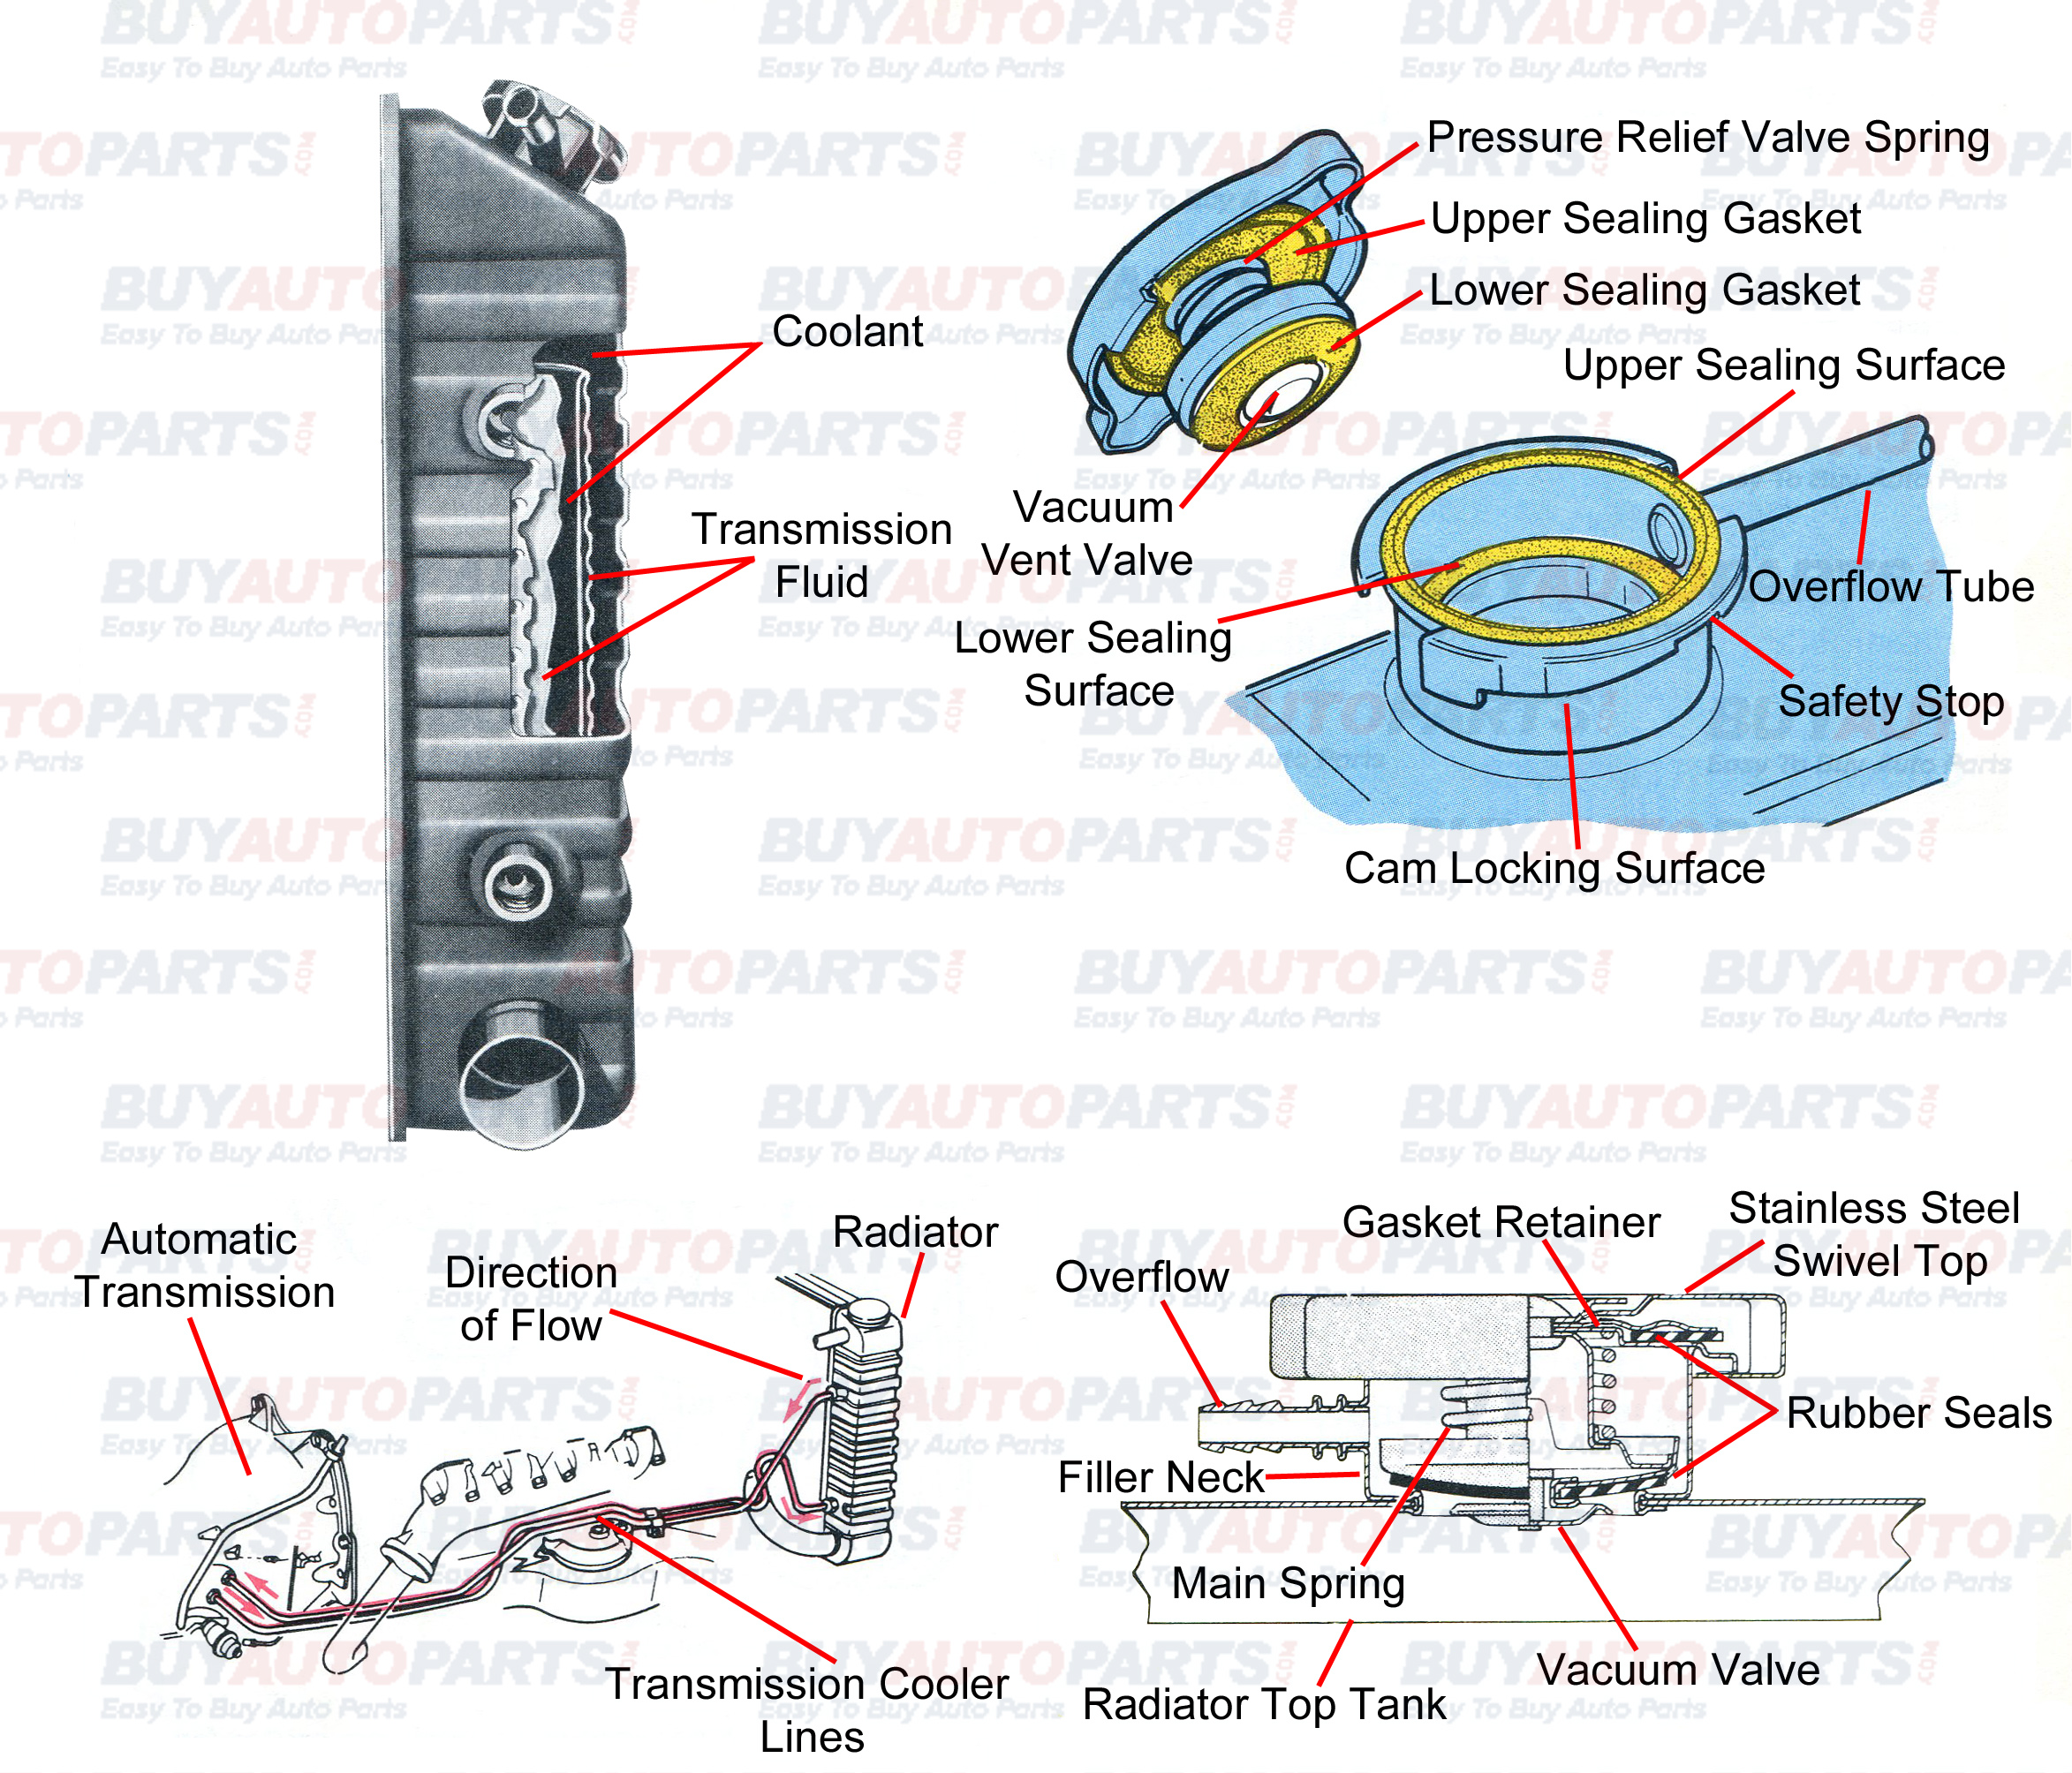 car radiator parts diagram automatice 2000 bmw e46 radiator parts diagram